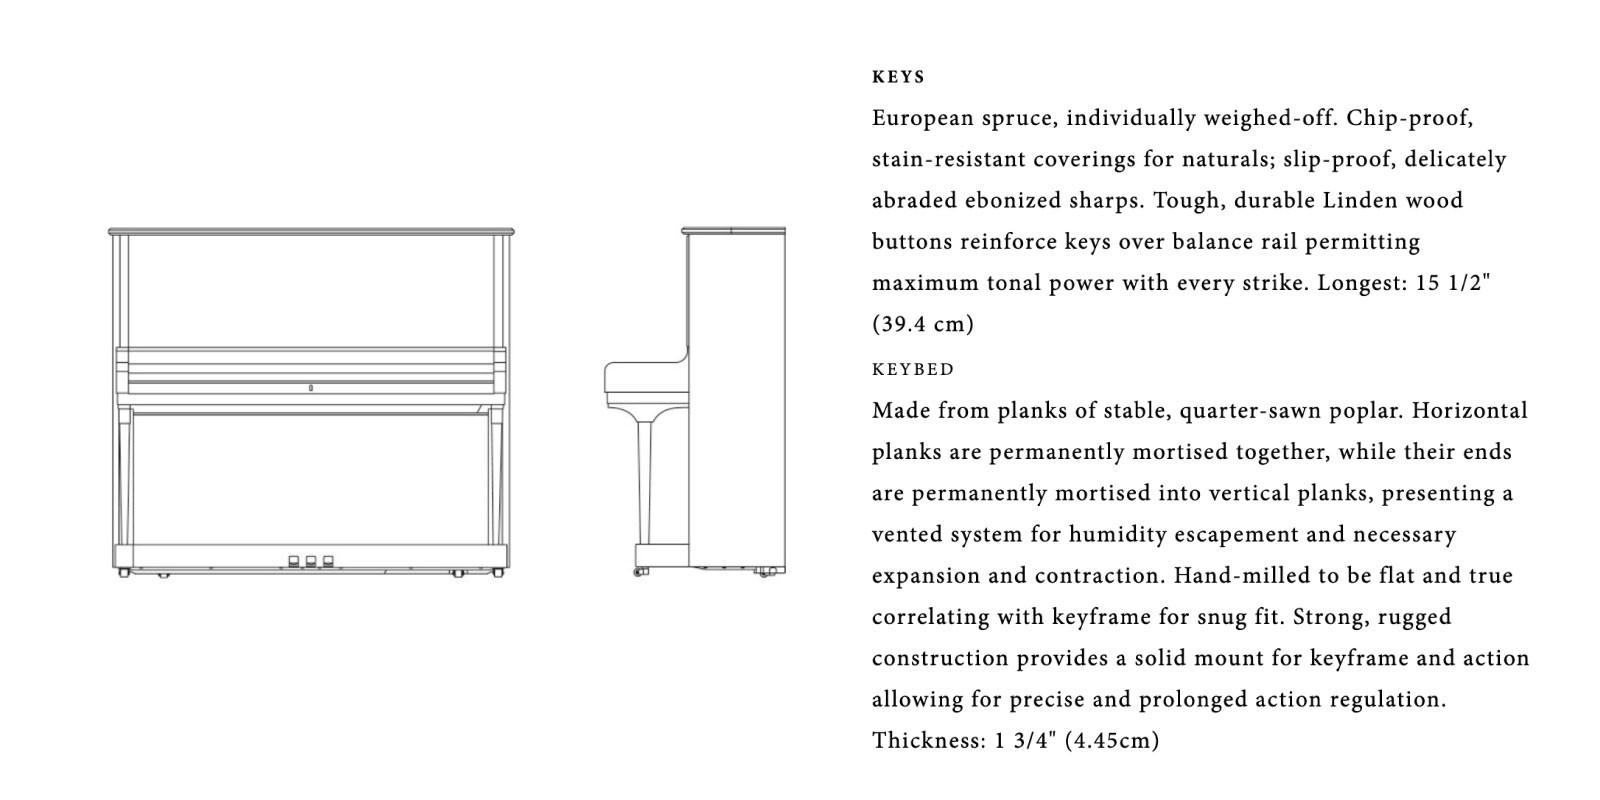 PP-Steinway-MODEL-1098-Details-4.jpg